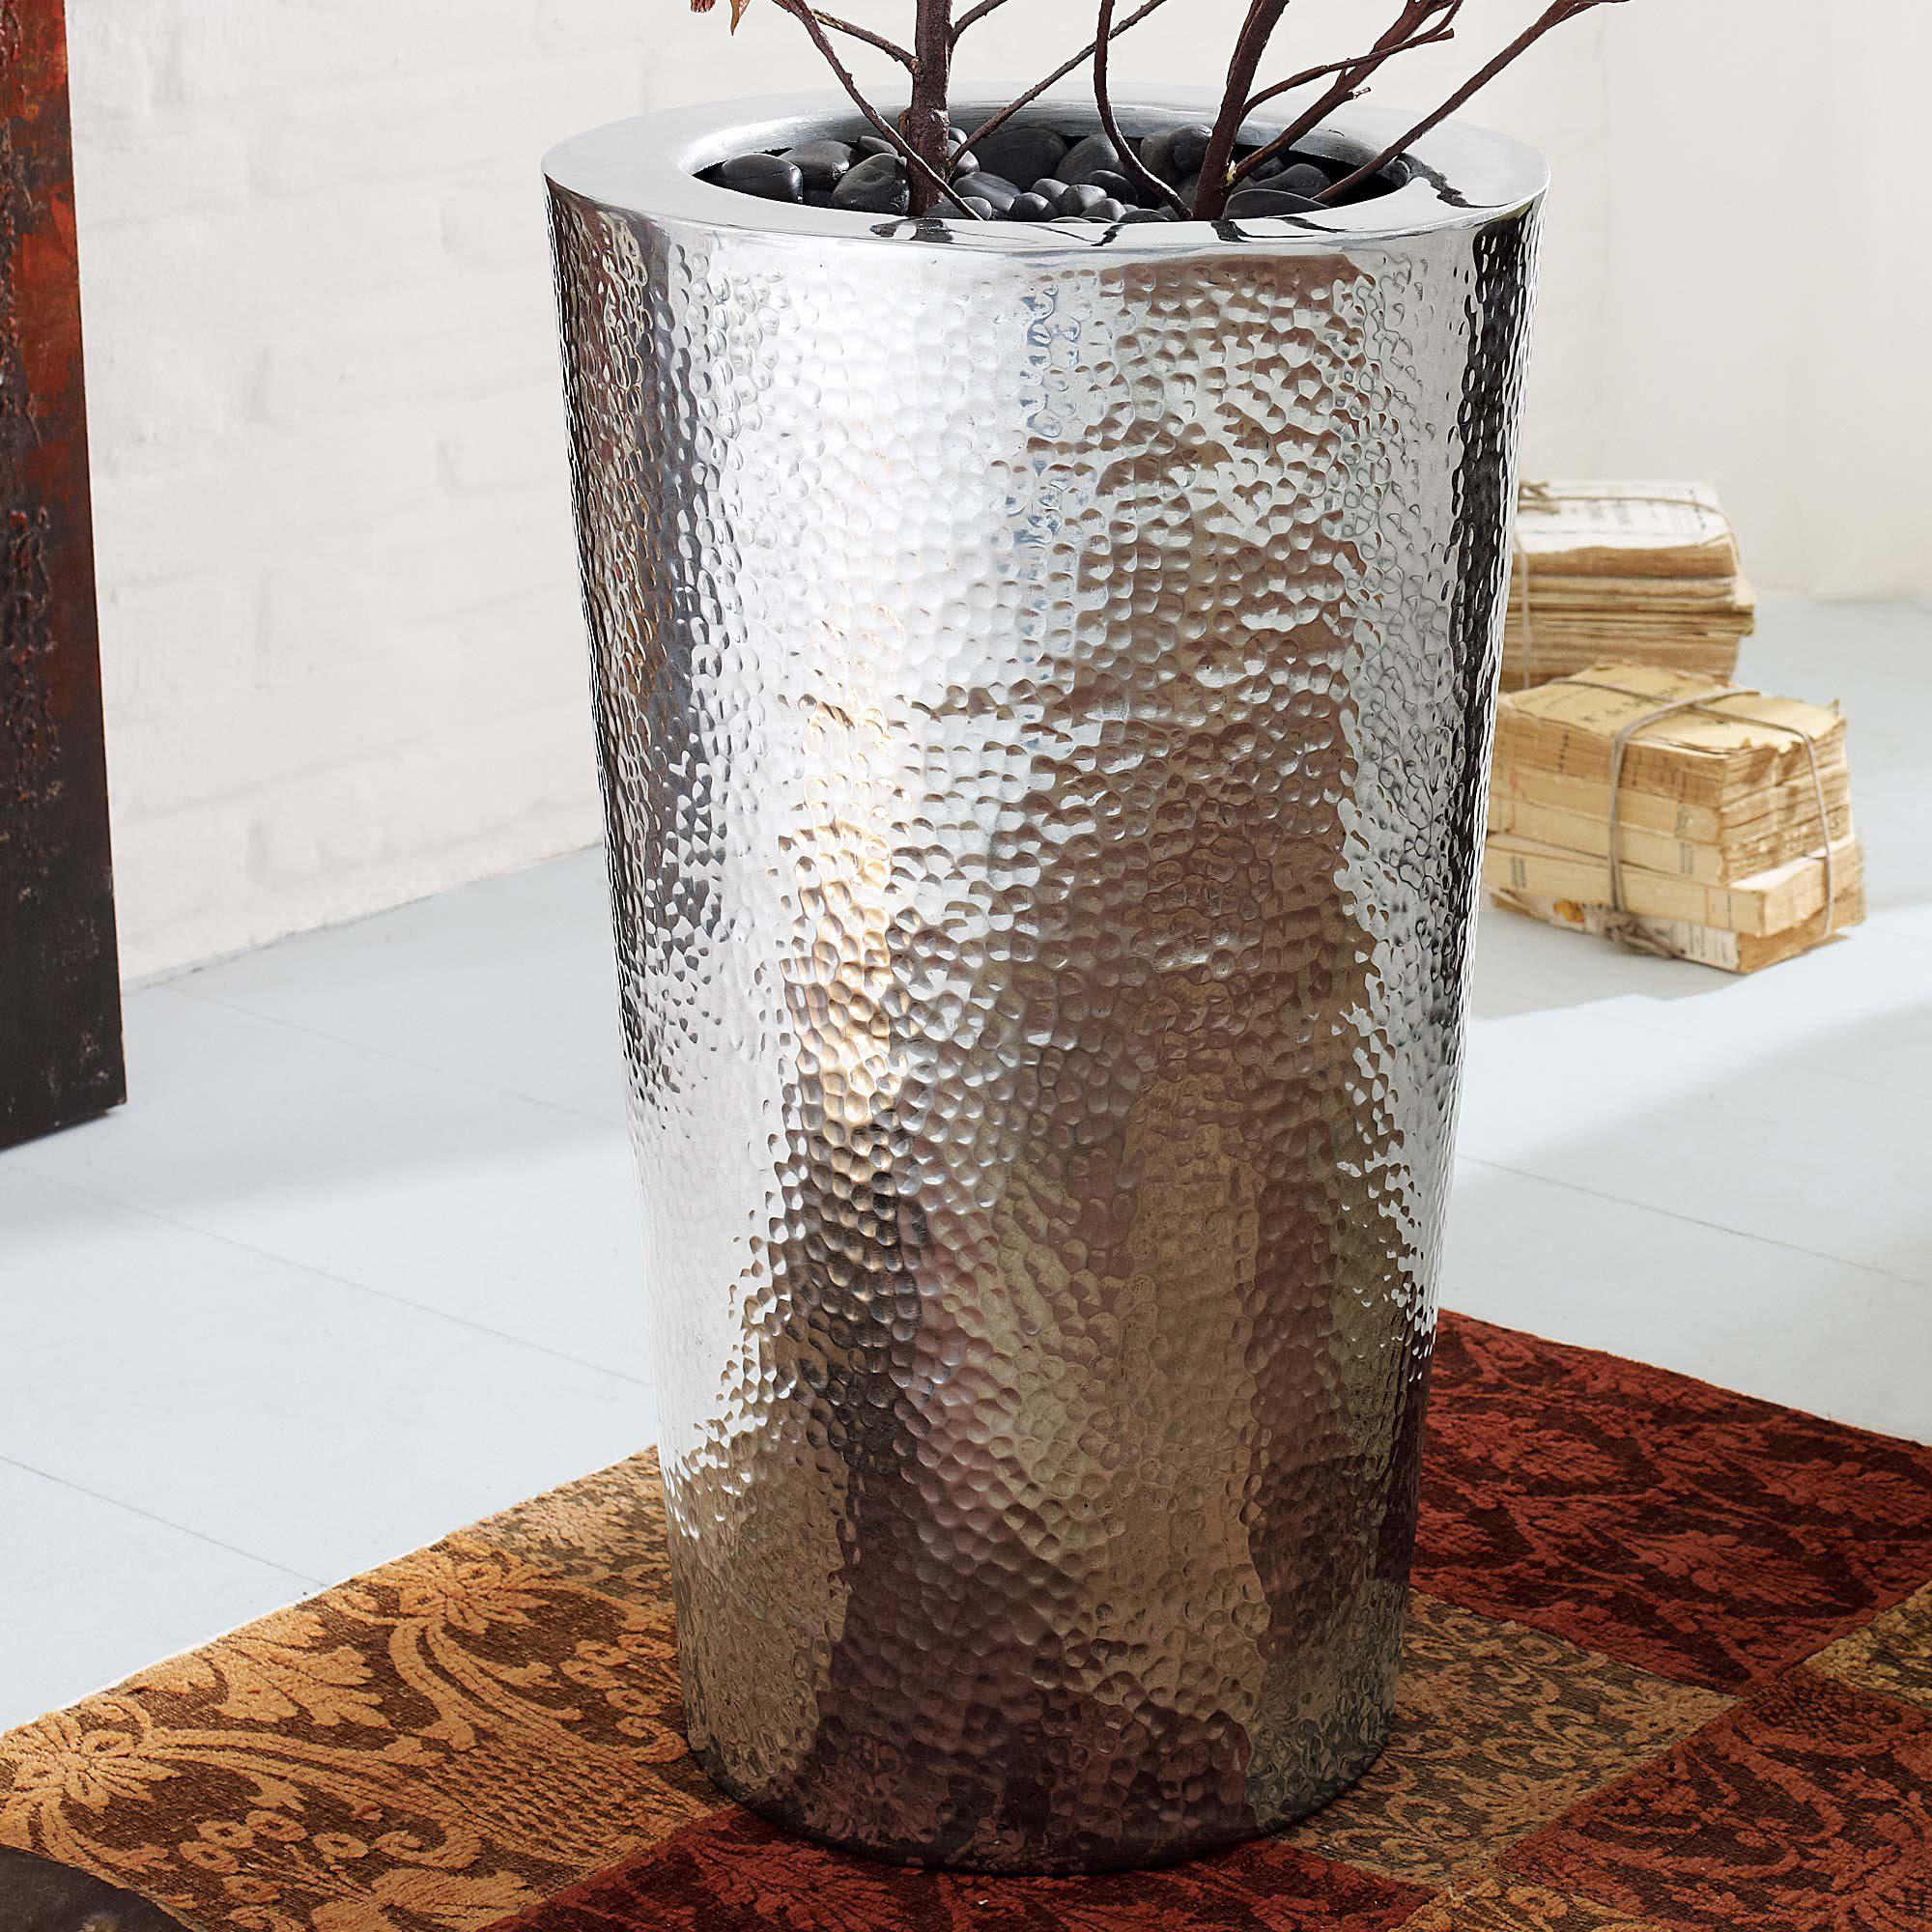 vase oriental gro h60 oben 39 5cm innen 28cm bertopf. Black Bedroom Furniture Sets. Home Design Ideas